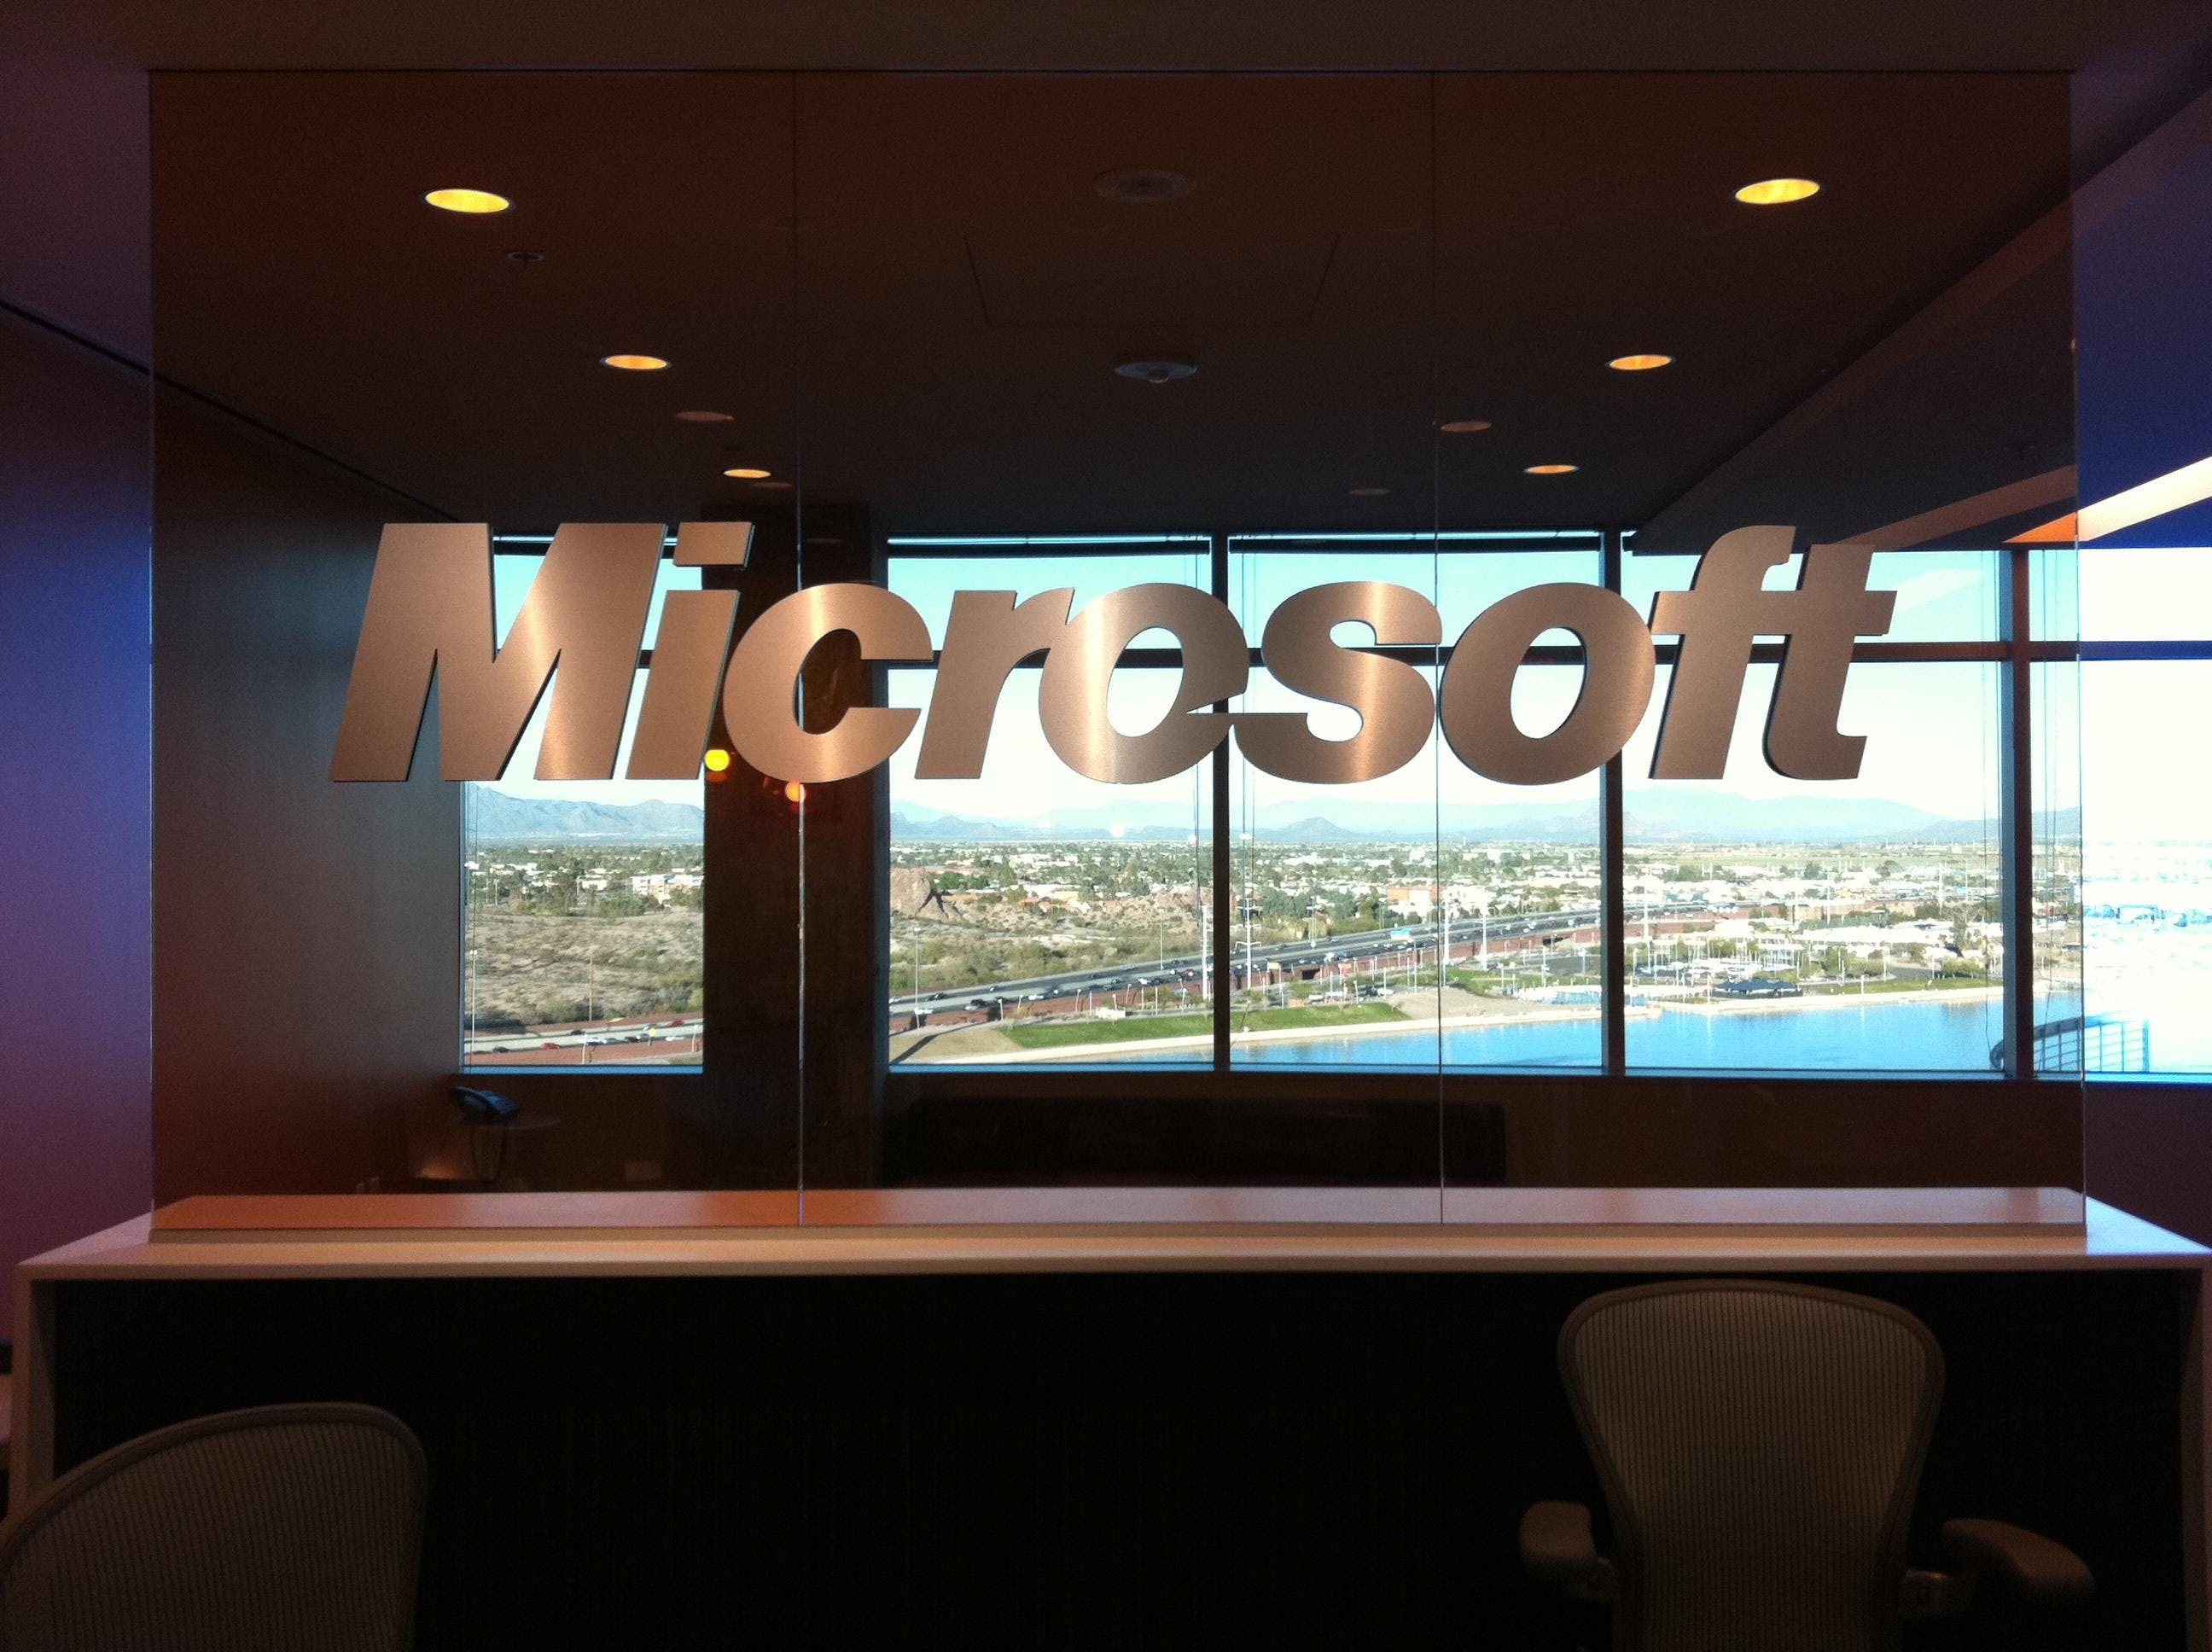 AZSMUG: Presents keeping up with Windows 10